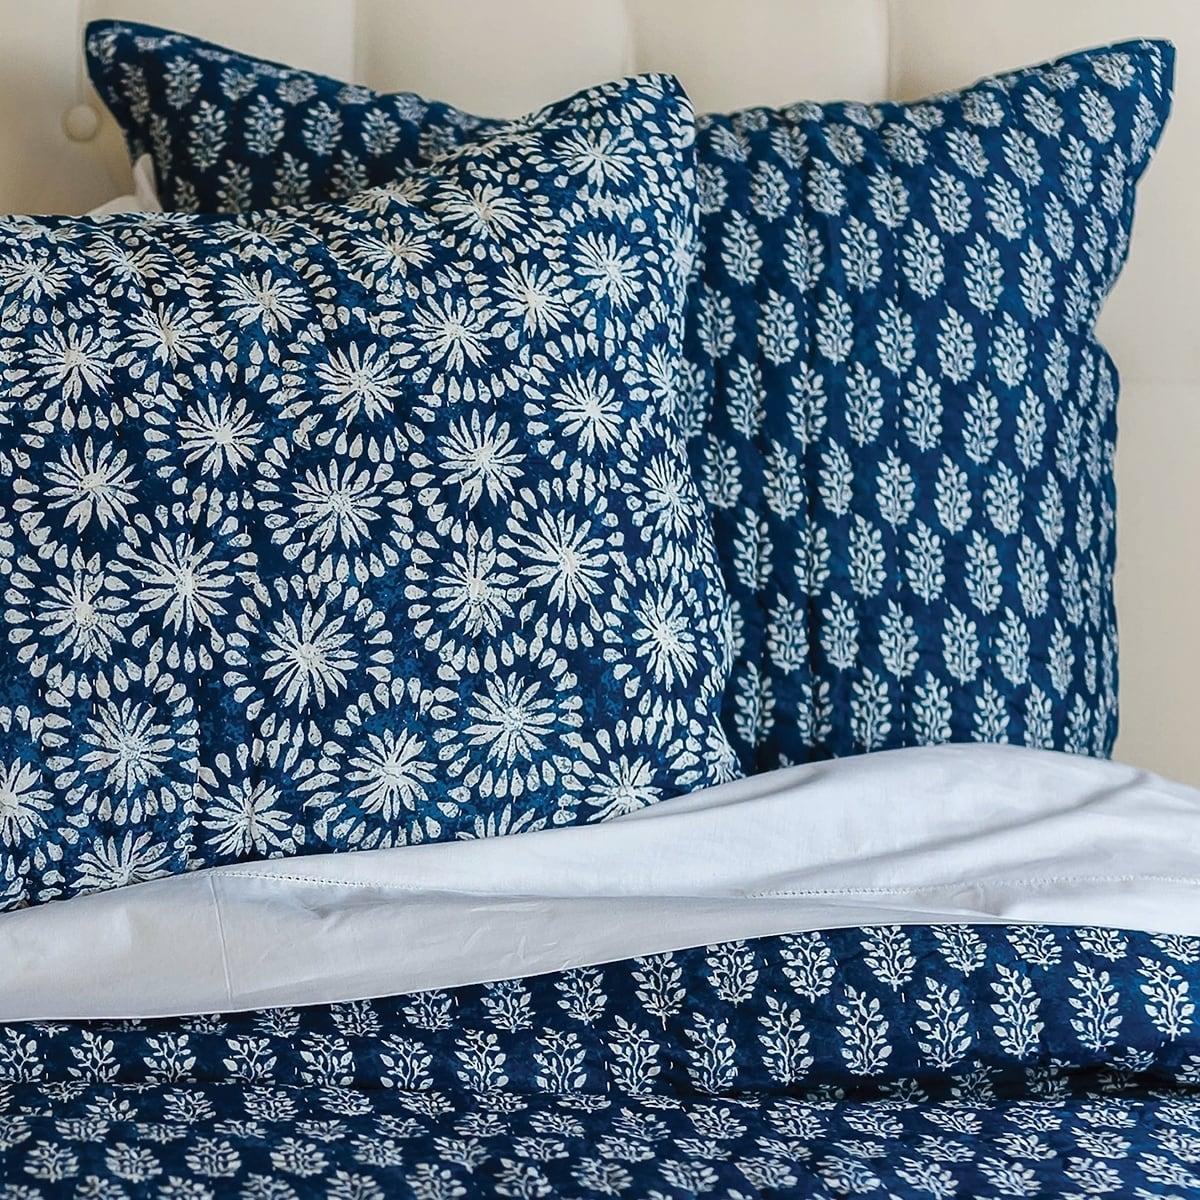 Adhira Hand Stitched Cotton Sham (Standard), Blue, C&F